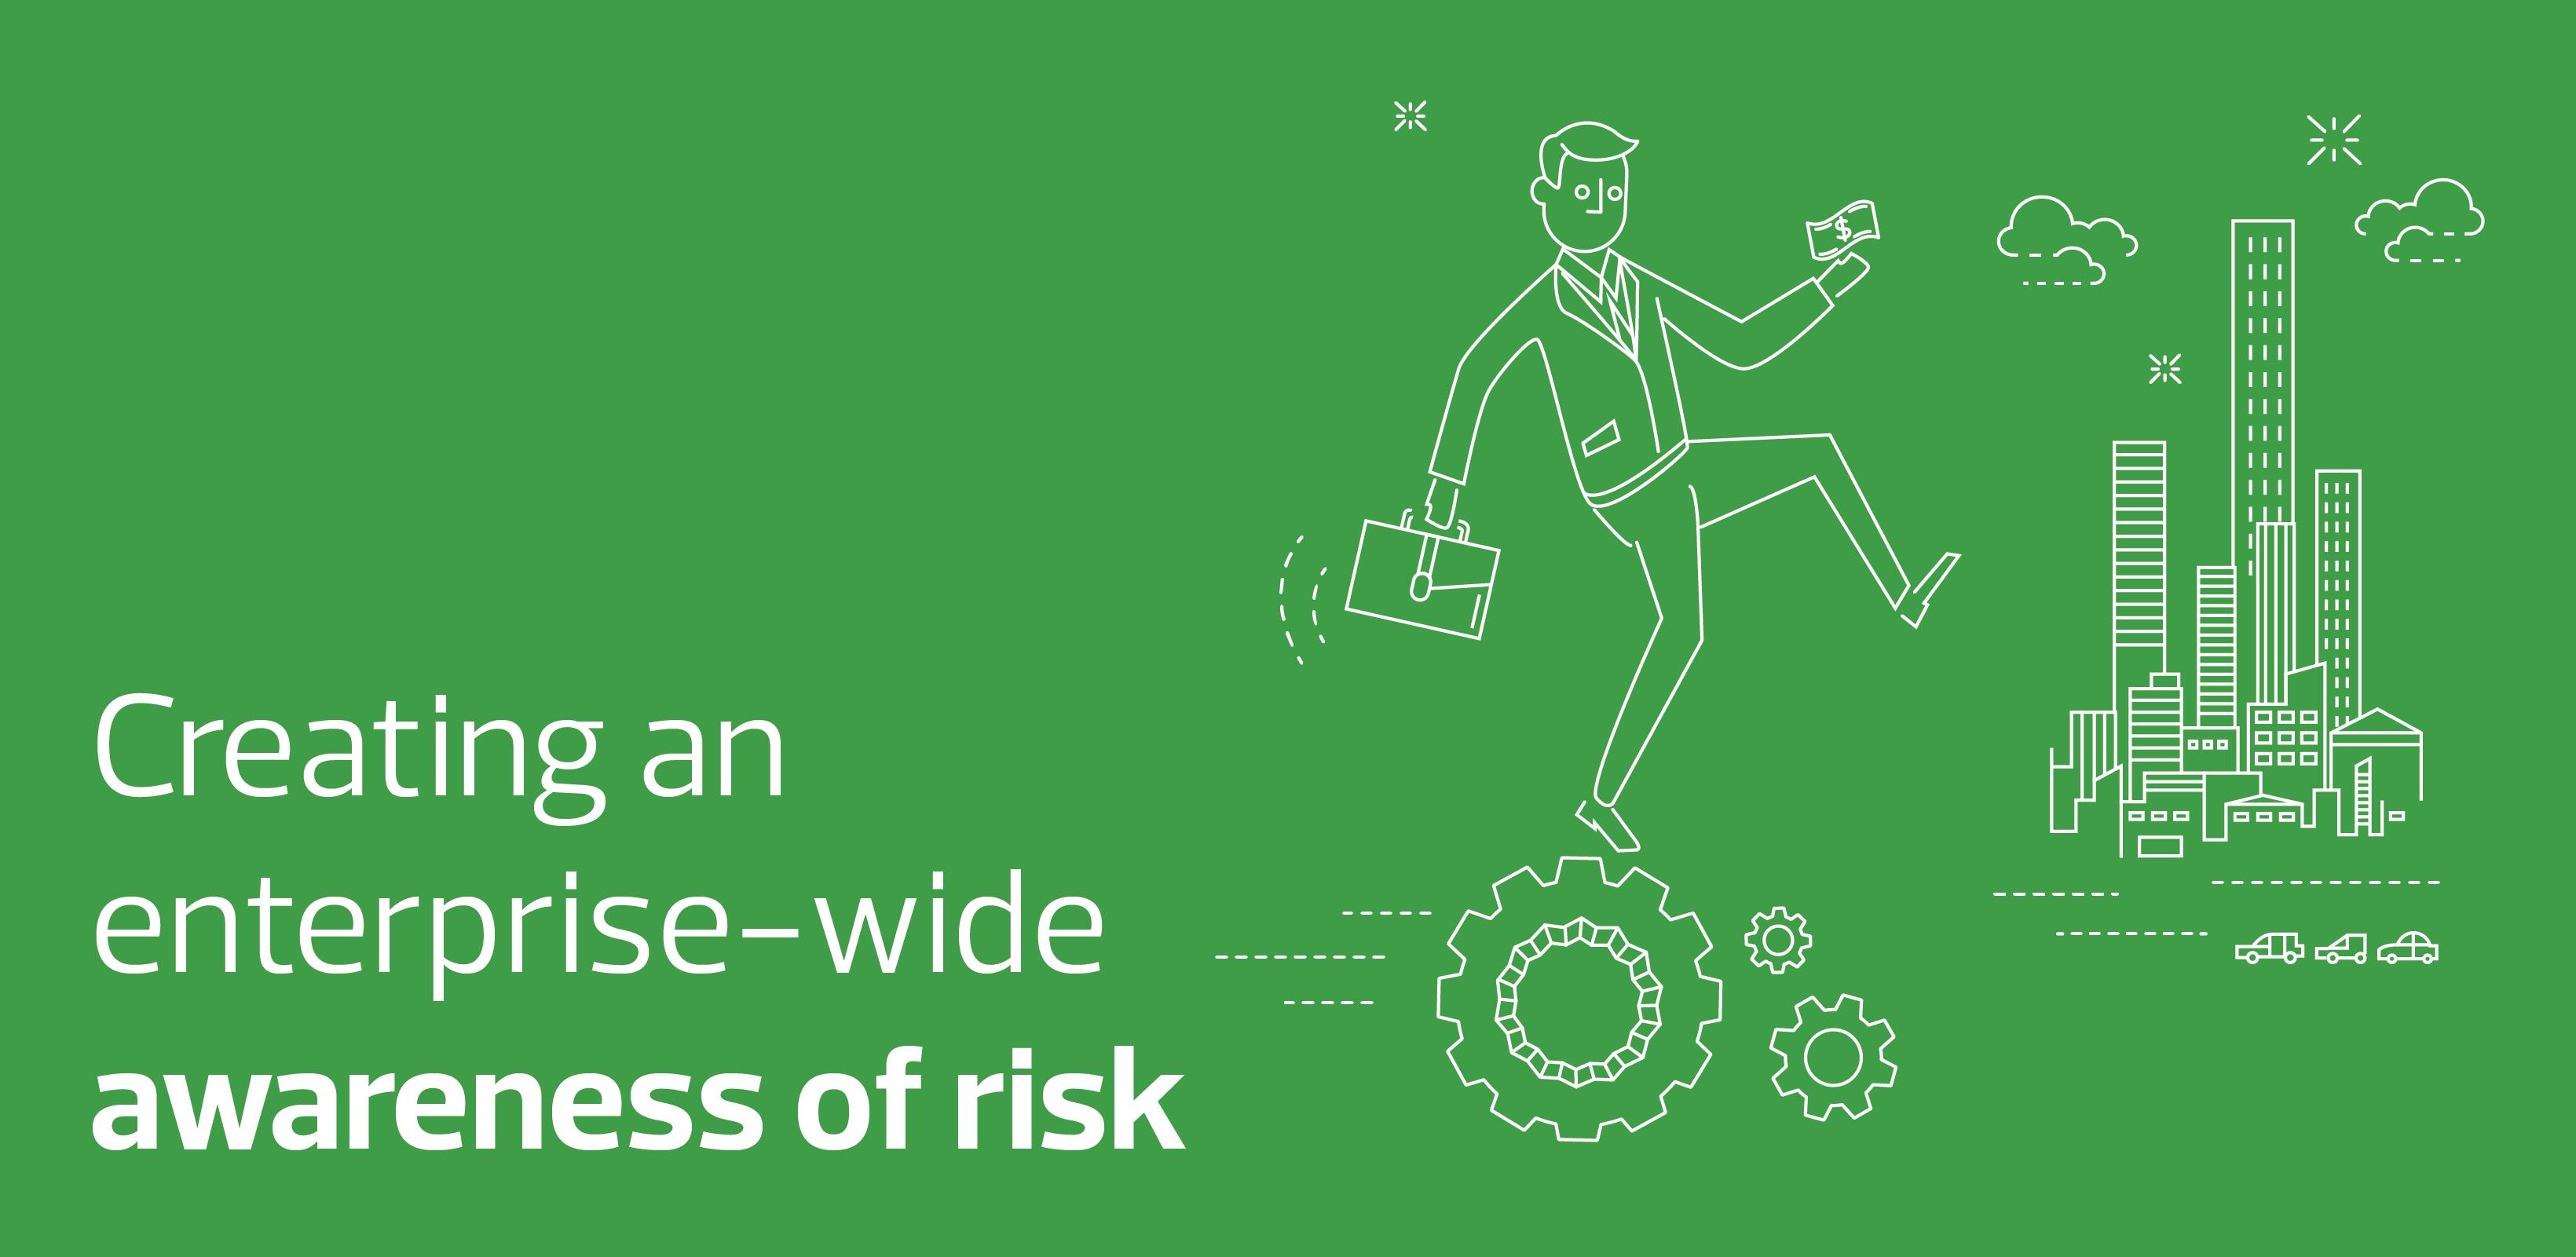 Creating an enterprise-wide awareness of risk